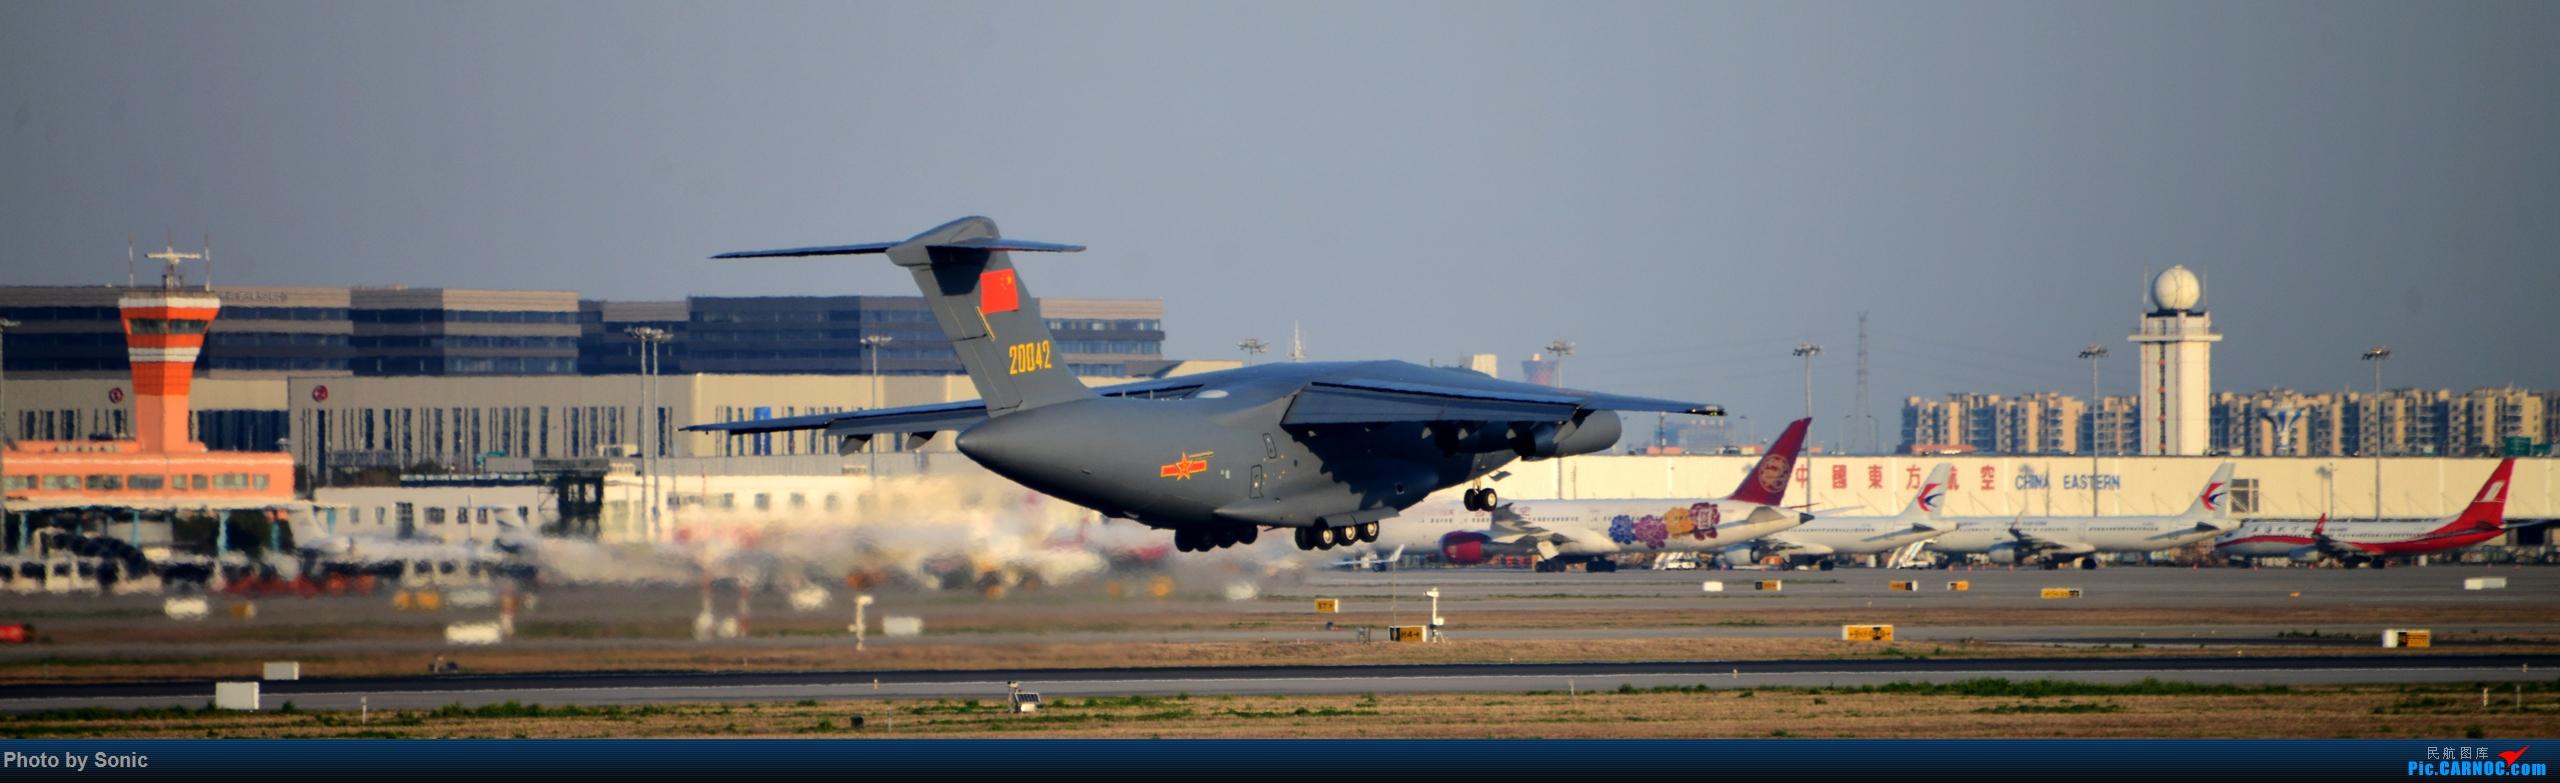 Re:运20 在虹桥的首次起飞!祝逆行勇士平安,愿早日战胜疫情! XIAN AIRCRAFT YUN-20